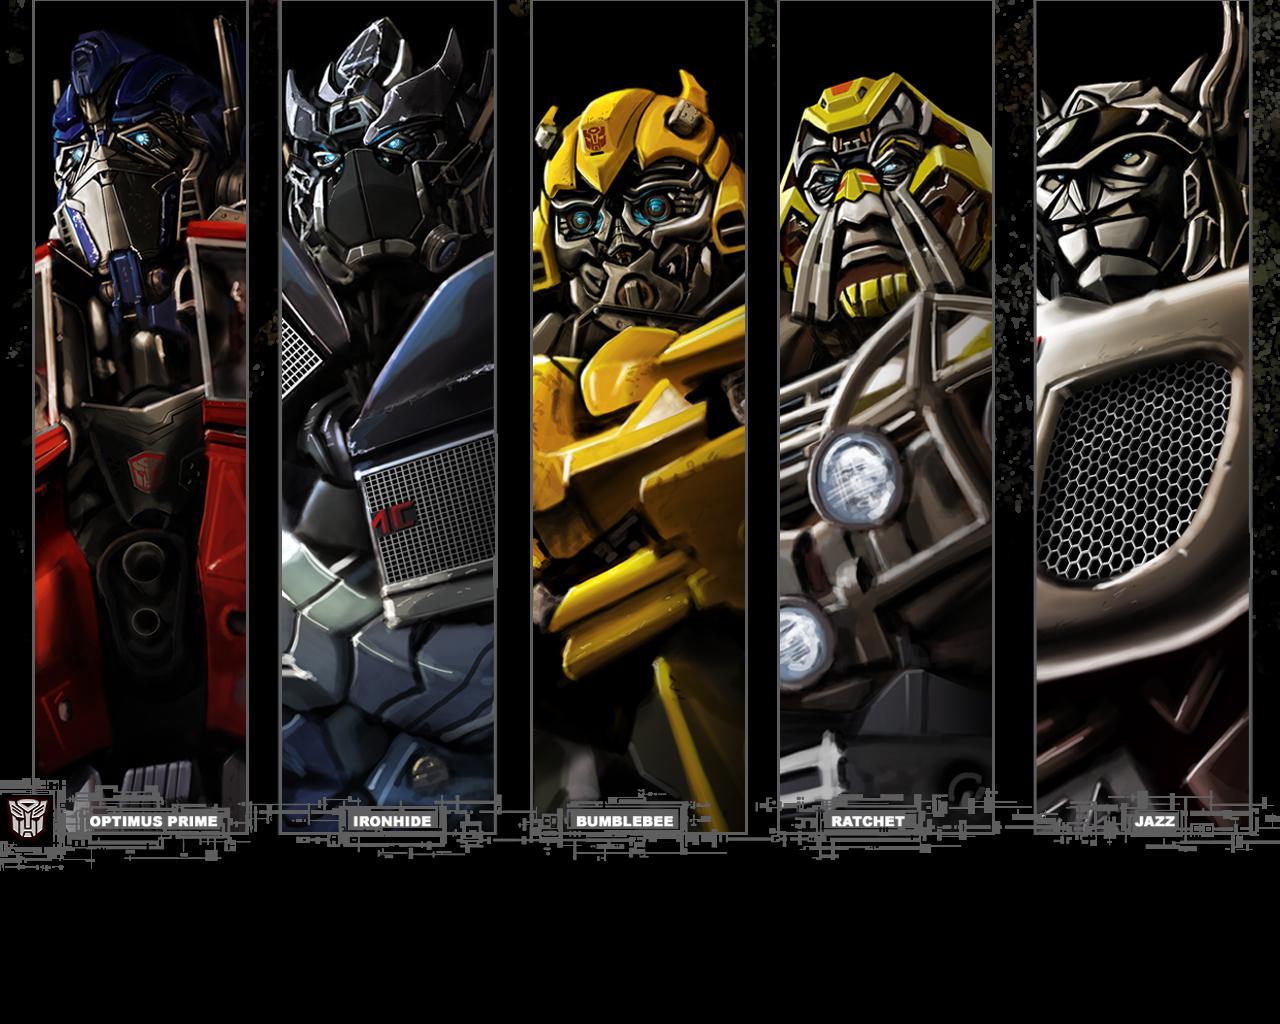 Autobot portraits